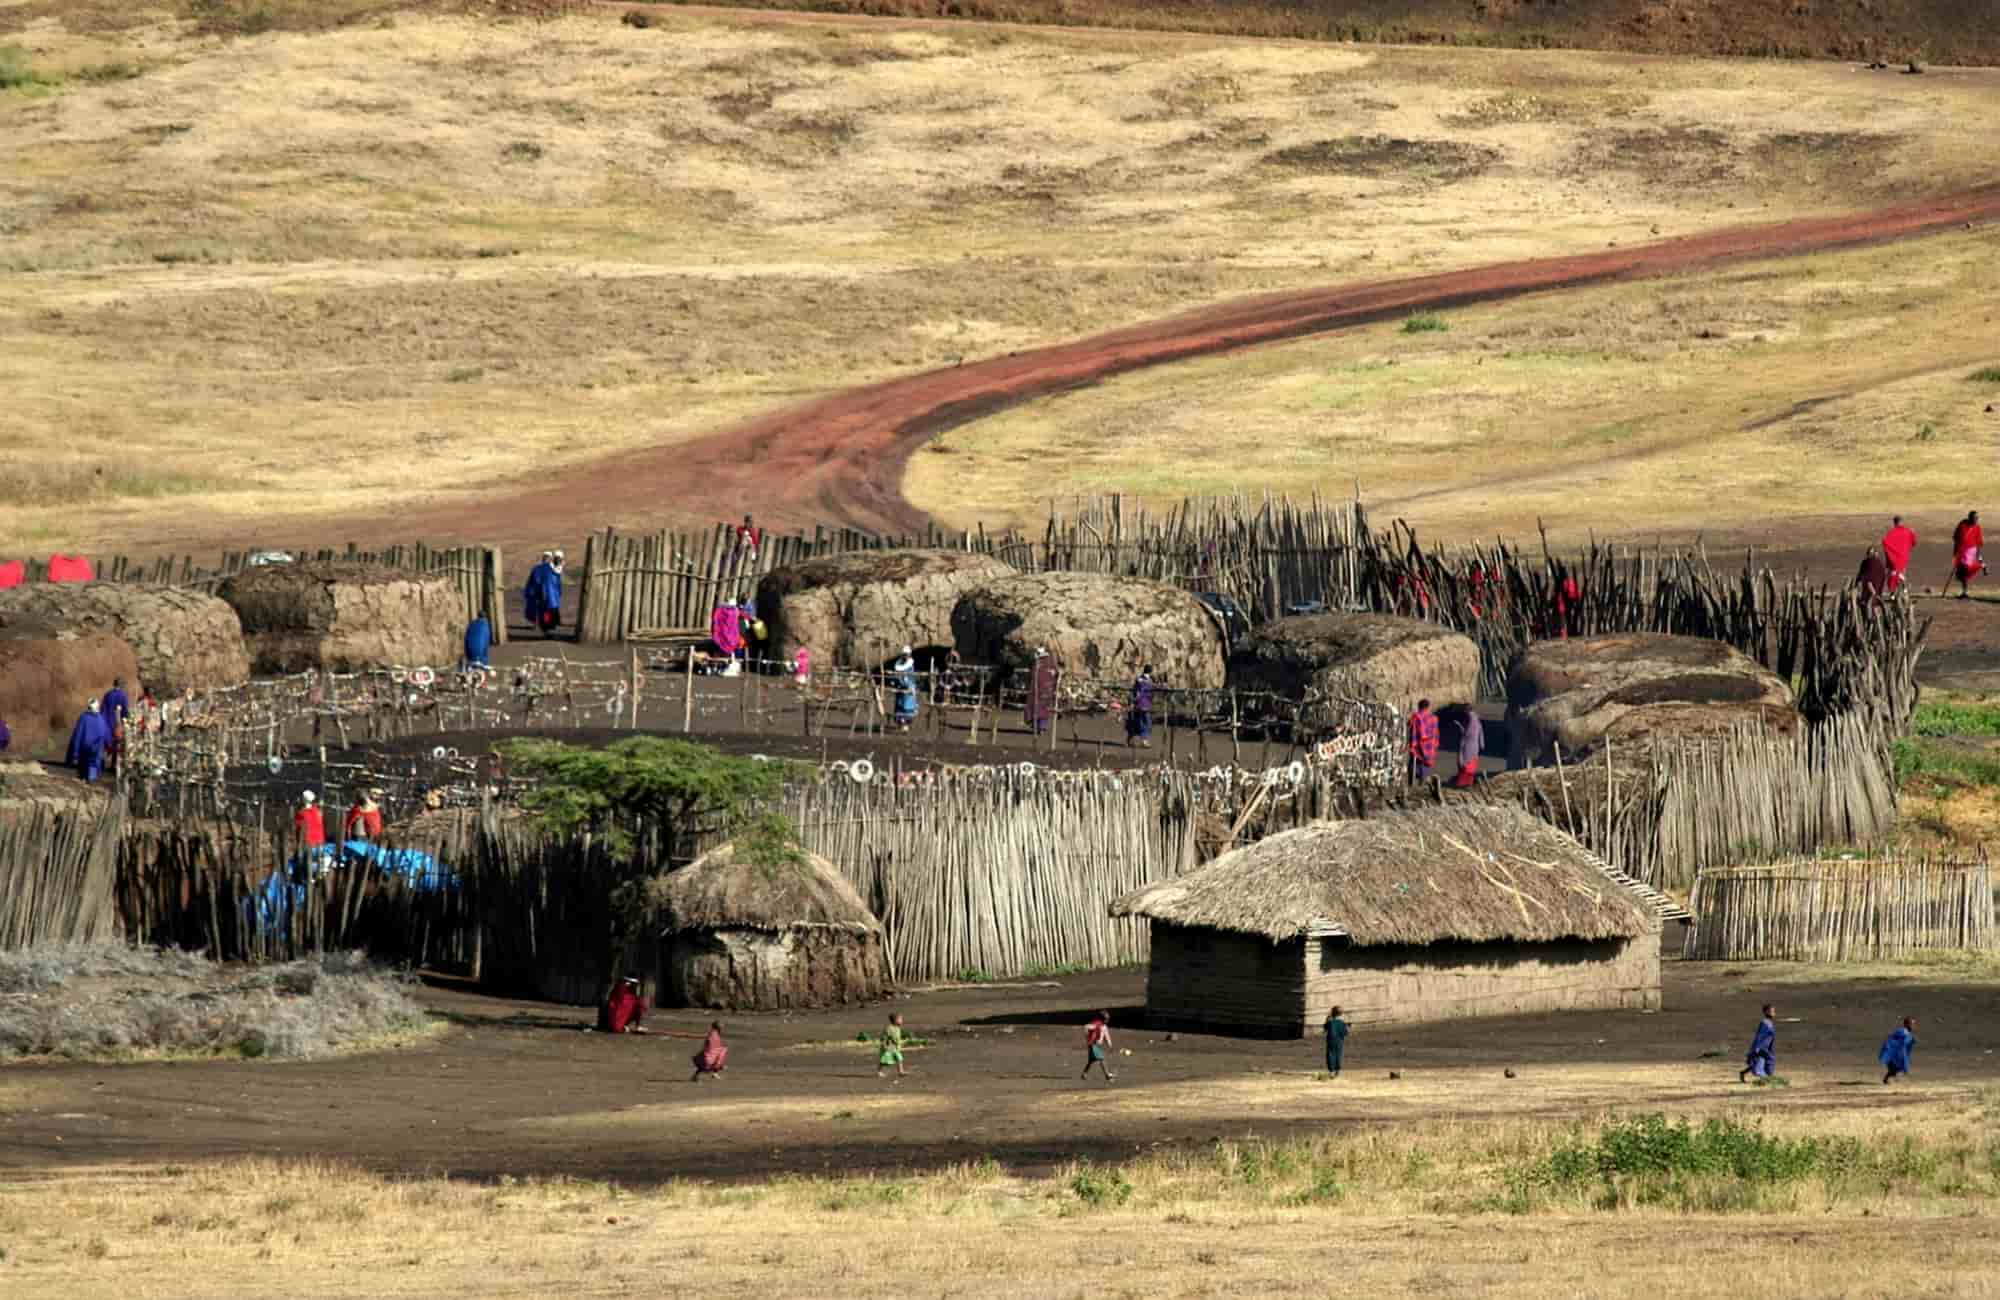 Voyage en Tanzanie - Parc National du Serengeti- Amplitudes